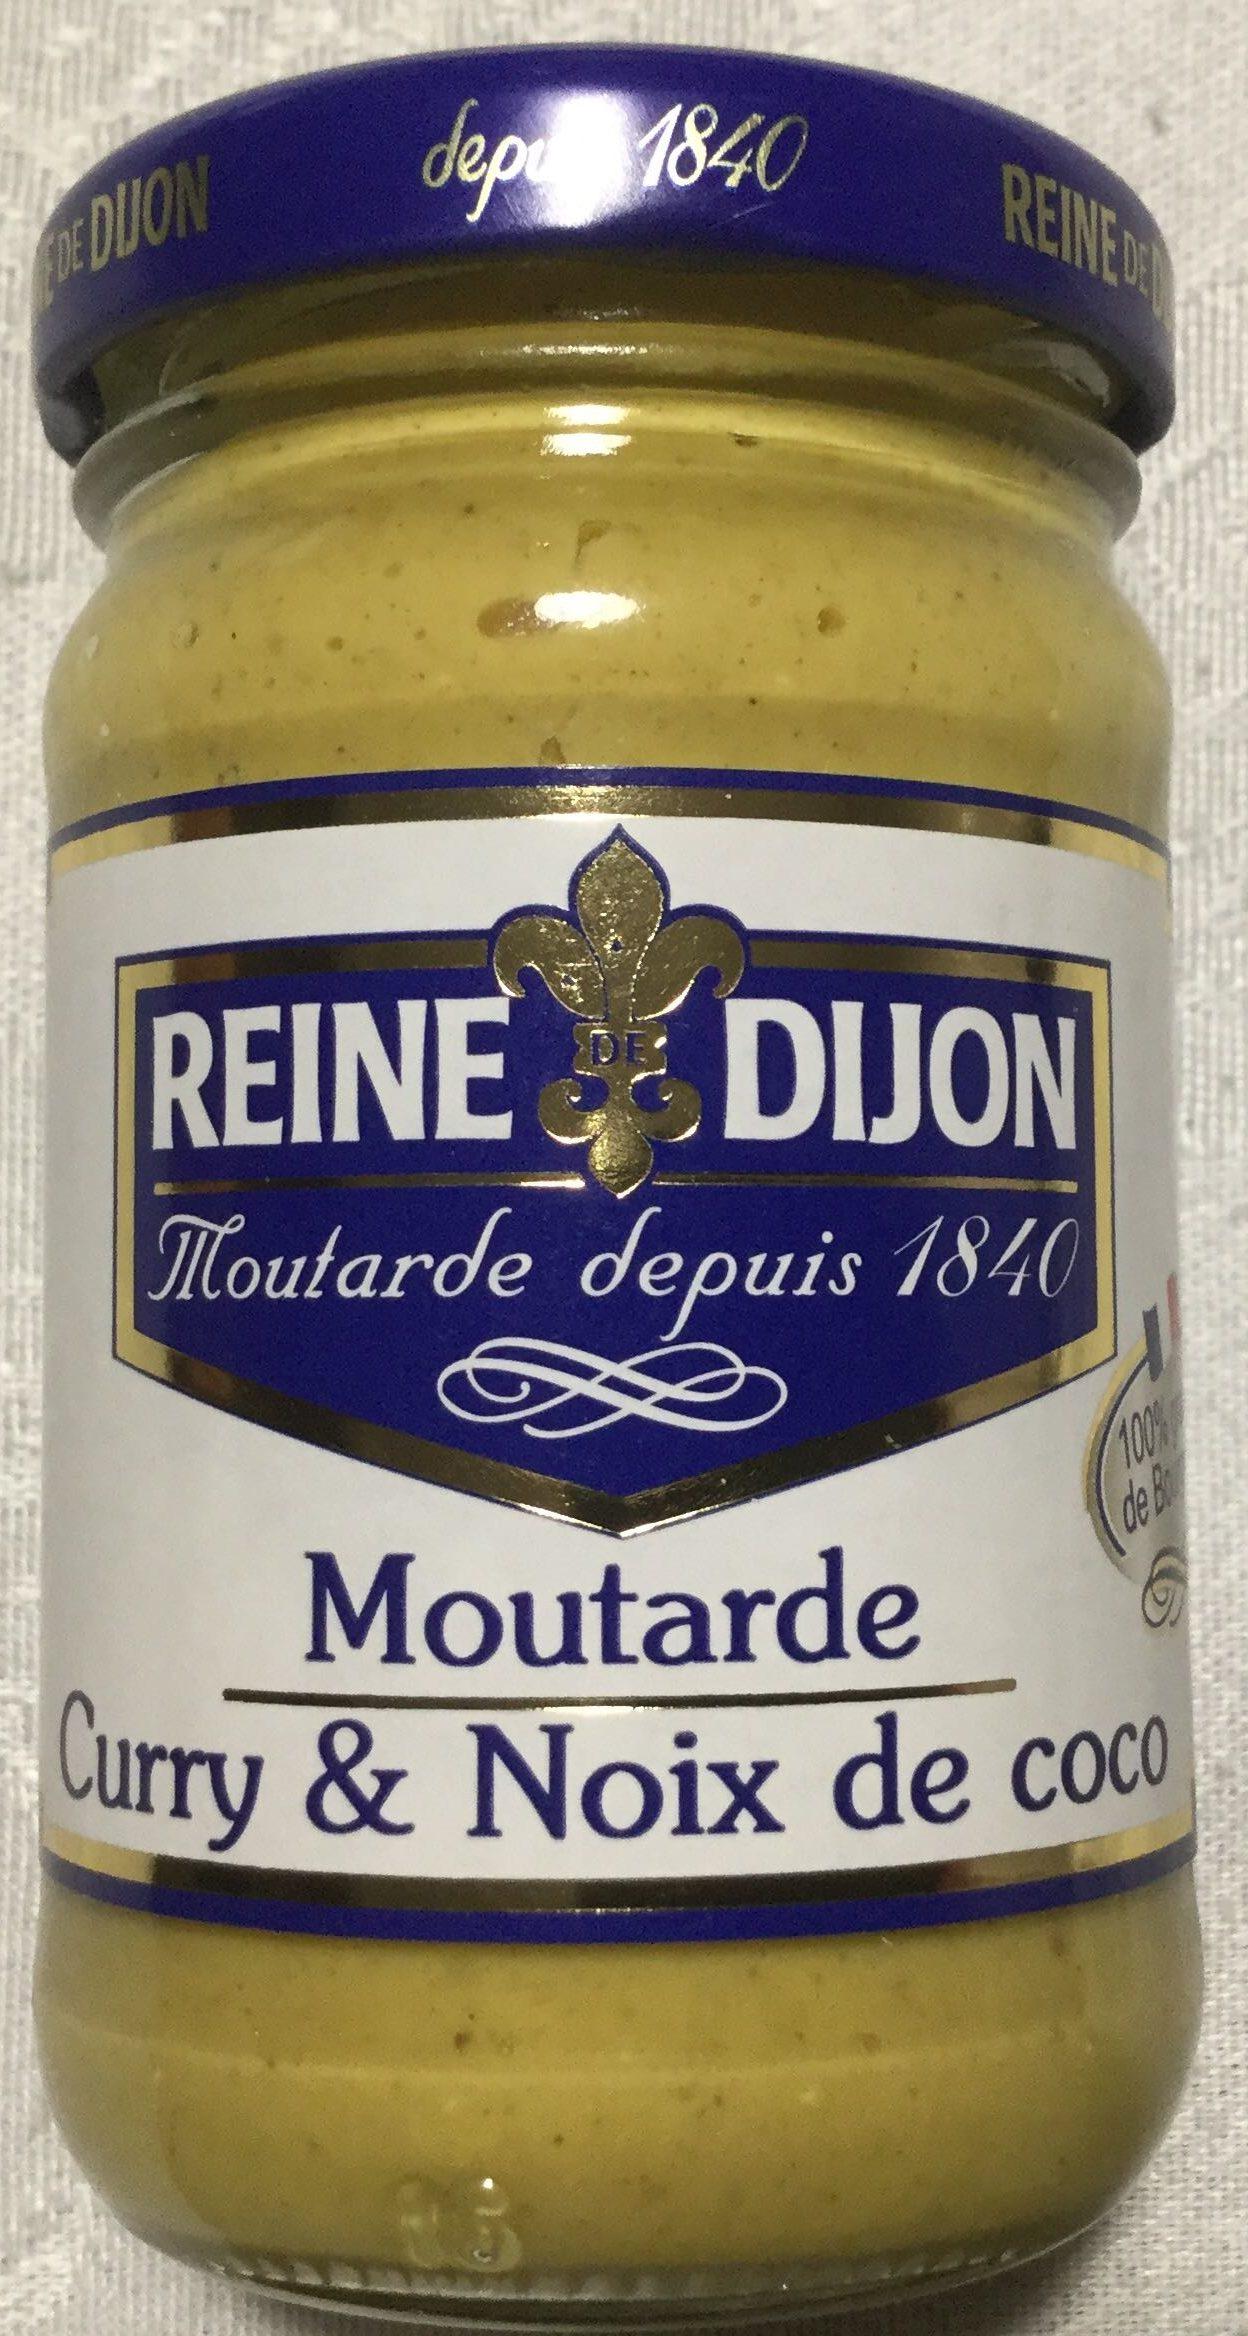 Moutarde Curry & Noix De Coco - Product